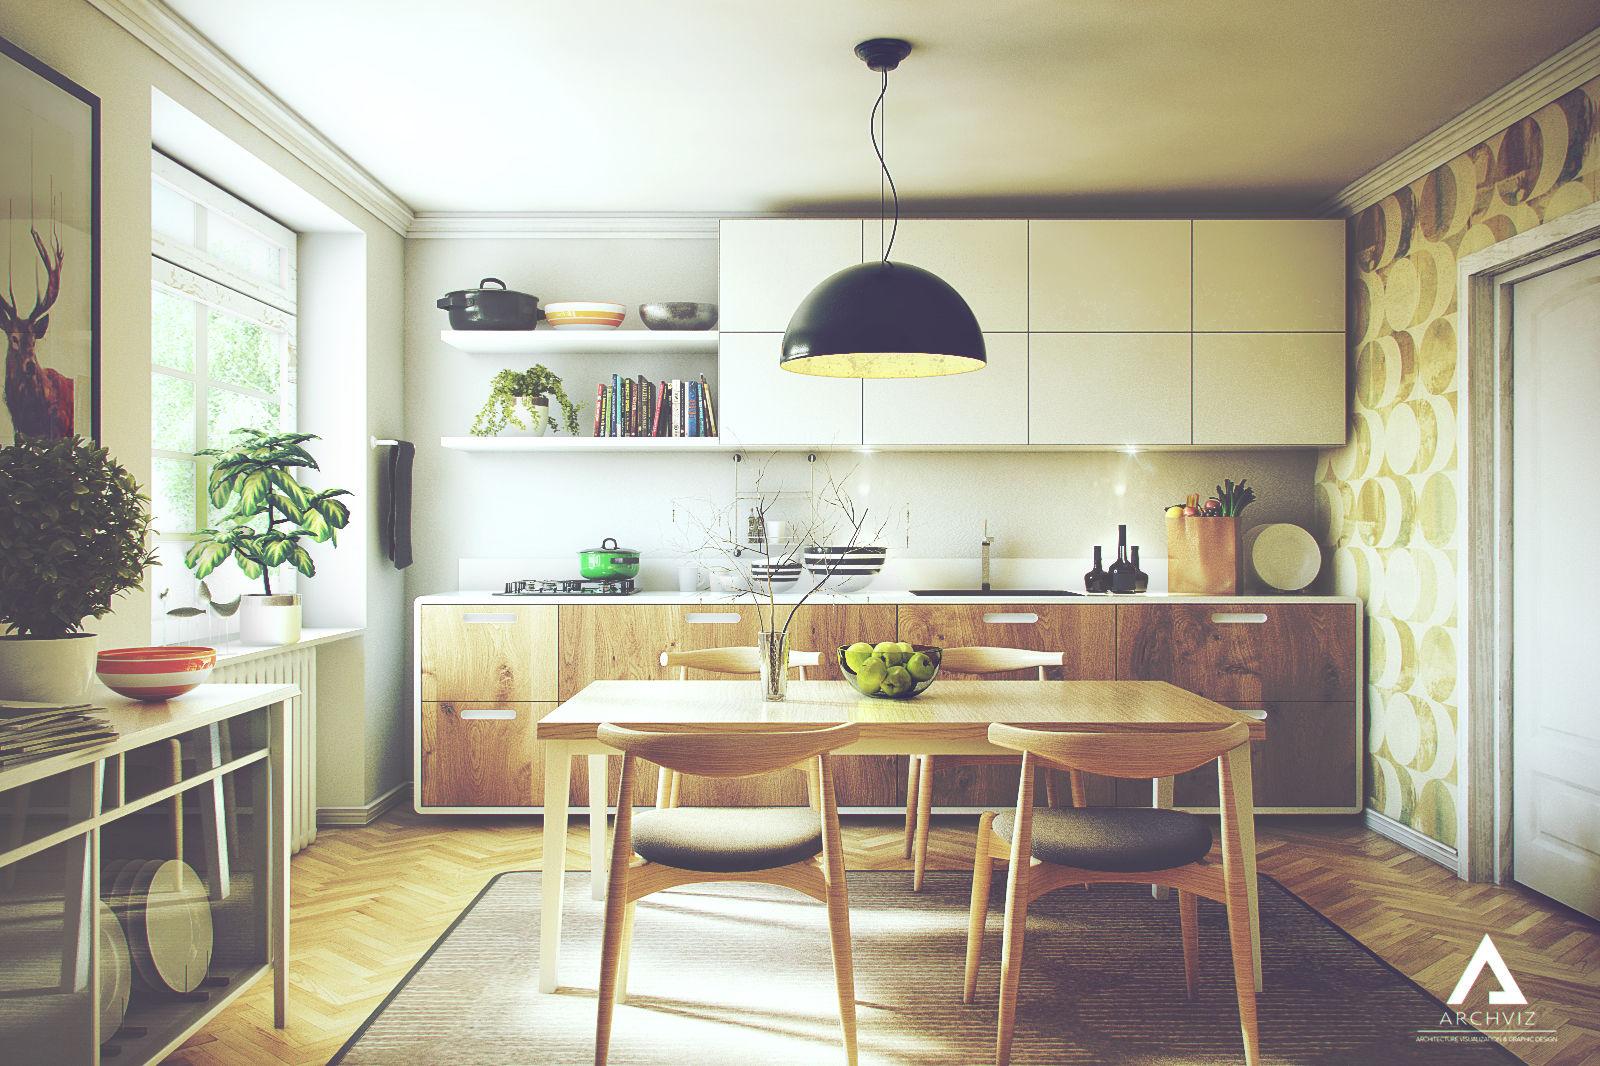 Kitchen Design By Kornny Kitchen Design By Kornny